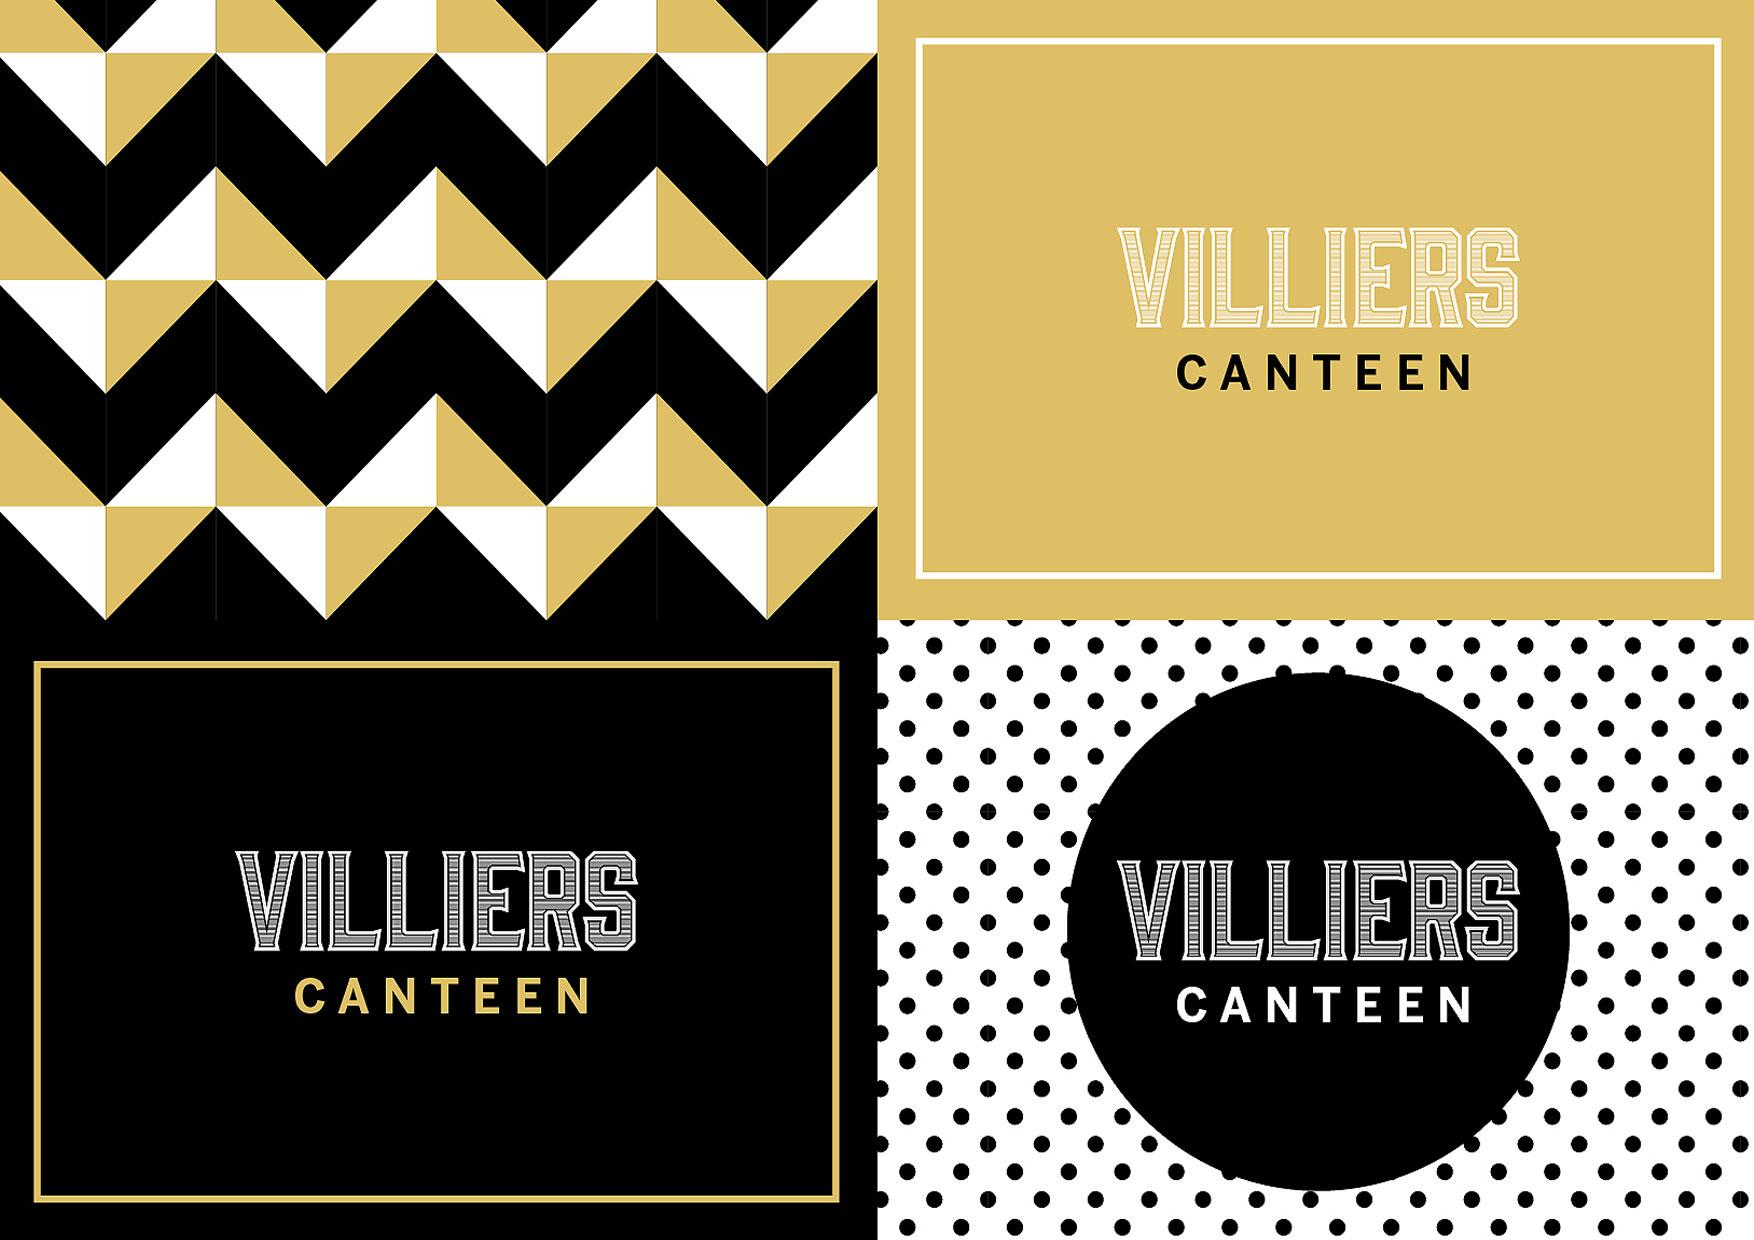 Handle-Branding-Villiers-Street-Canteen-Rebranding_02_0017_Background.jpg